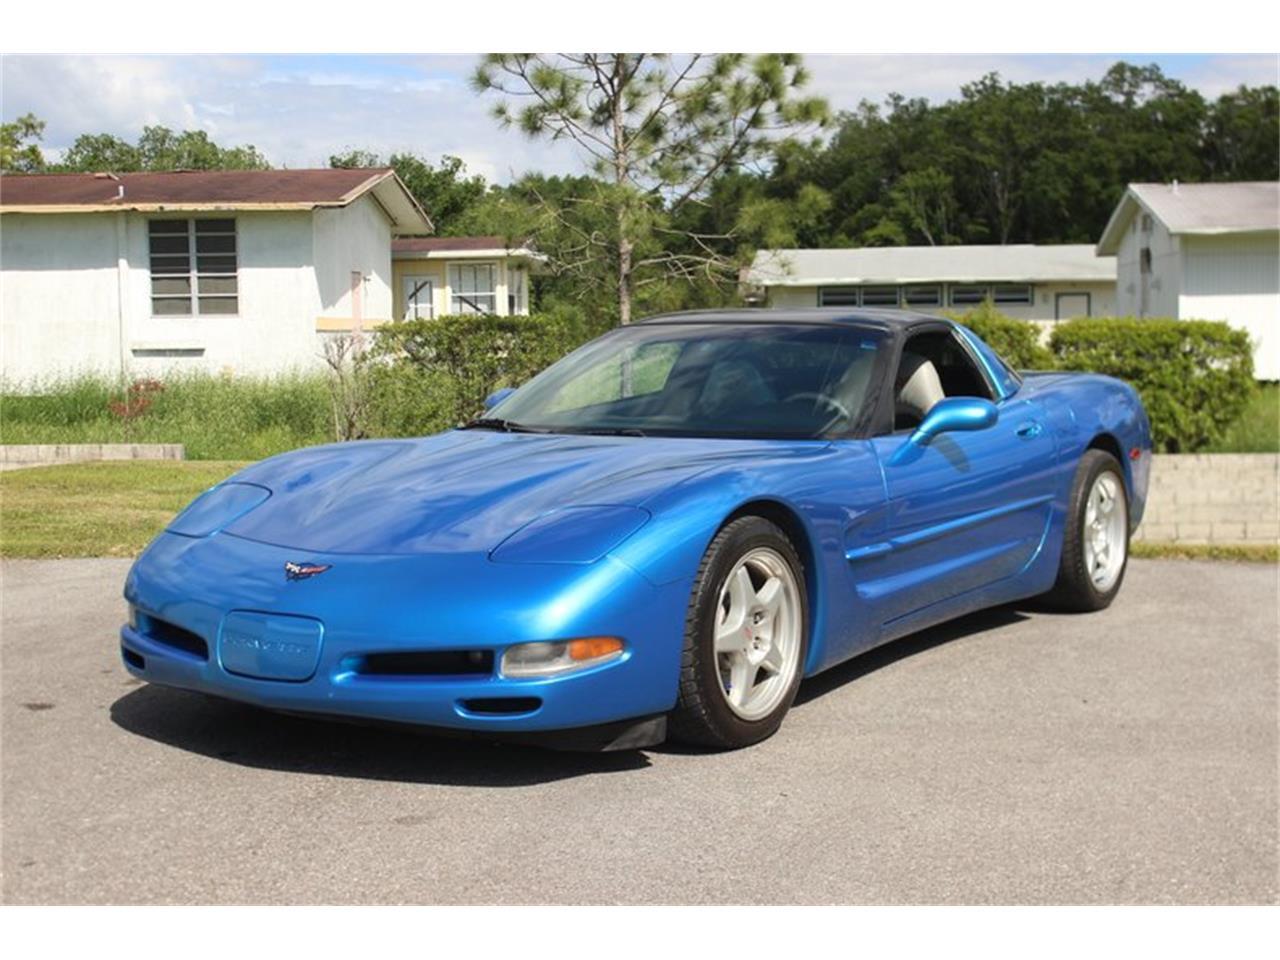 Large Picture of '97 Chevrolet Corvette located in Palmetto Florida - $10,497.00 - PSRK